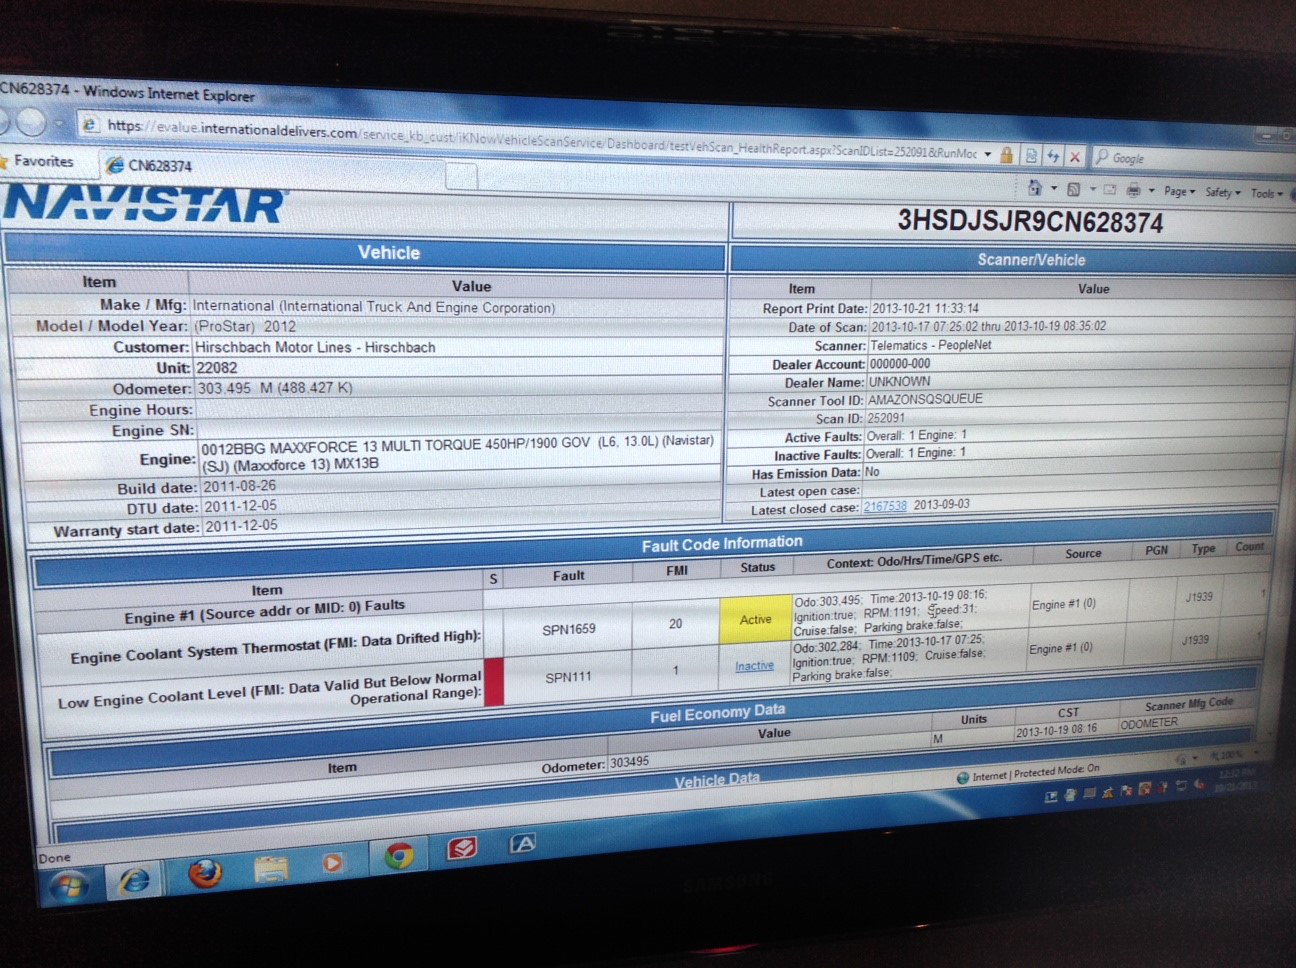 PeopleNet sending active fault codes to Navistar diagnostics